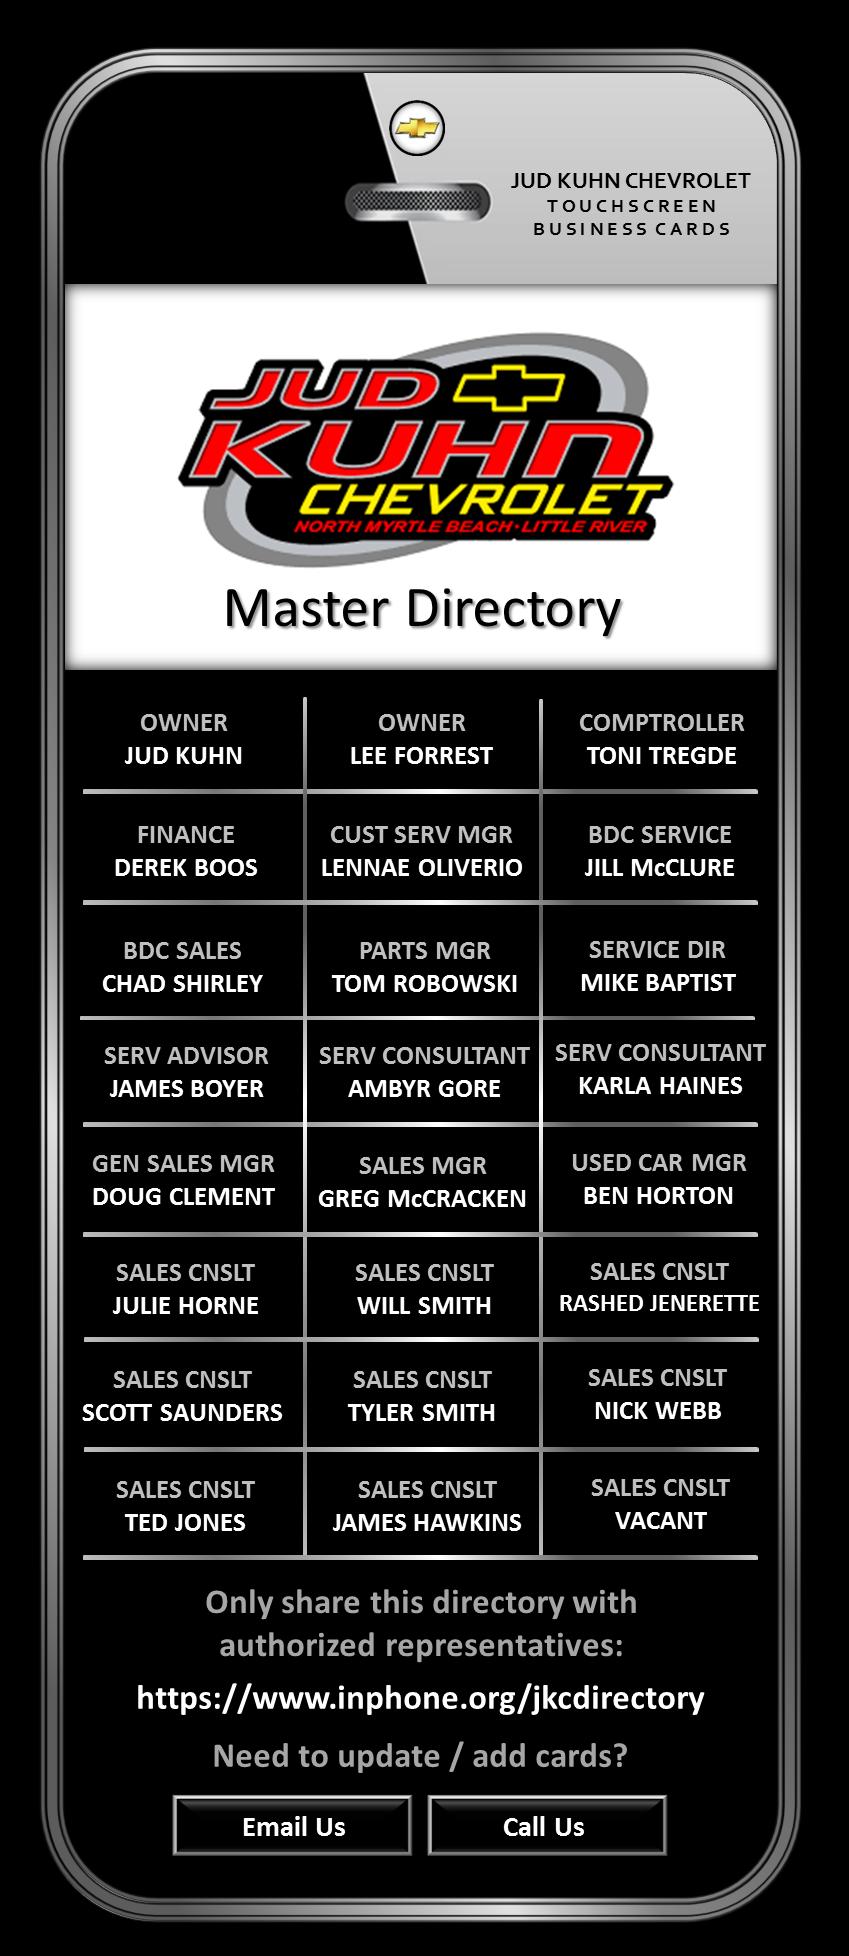 Jud Kuhn Chevrolet Master Directory.png